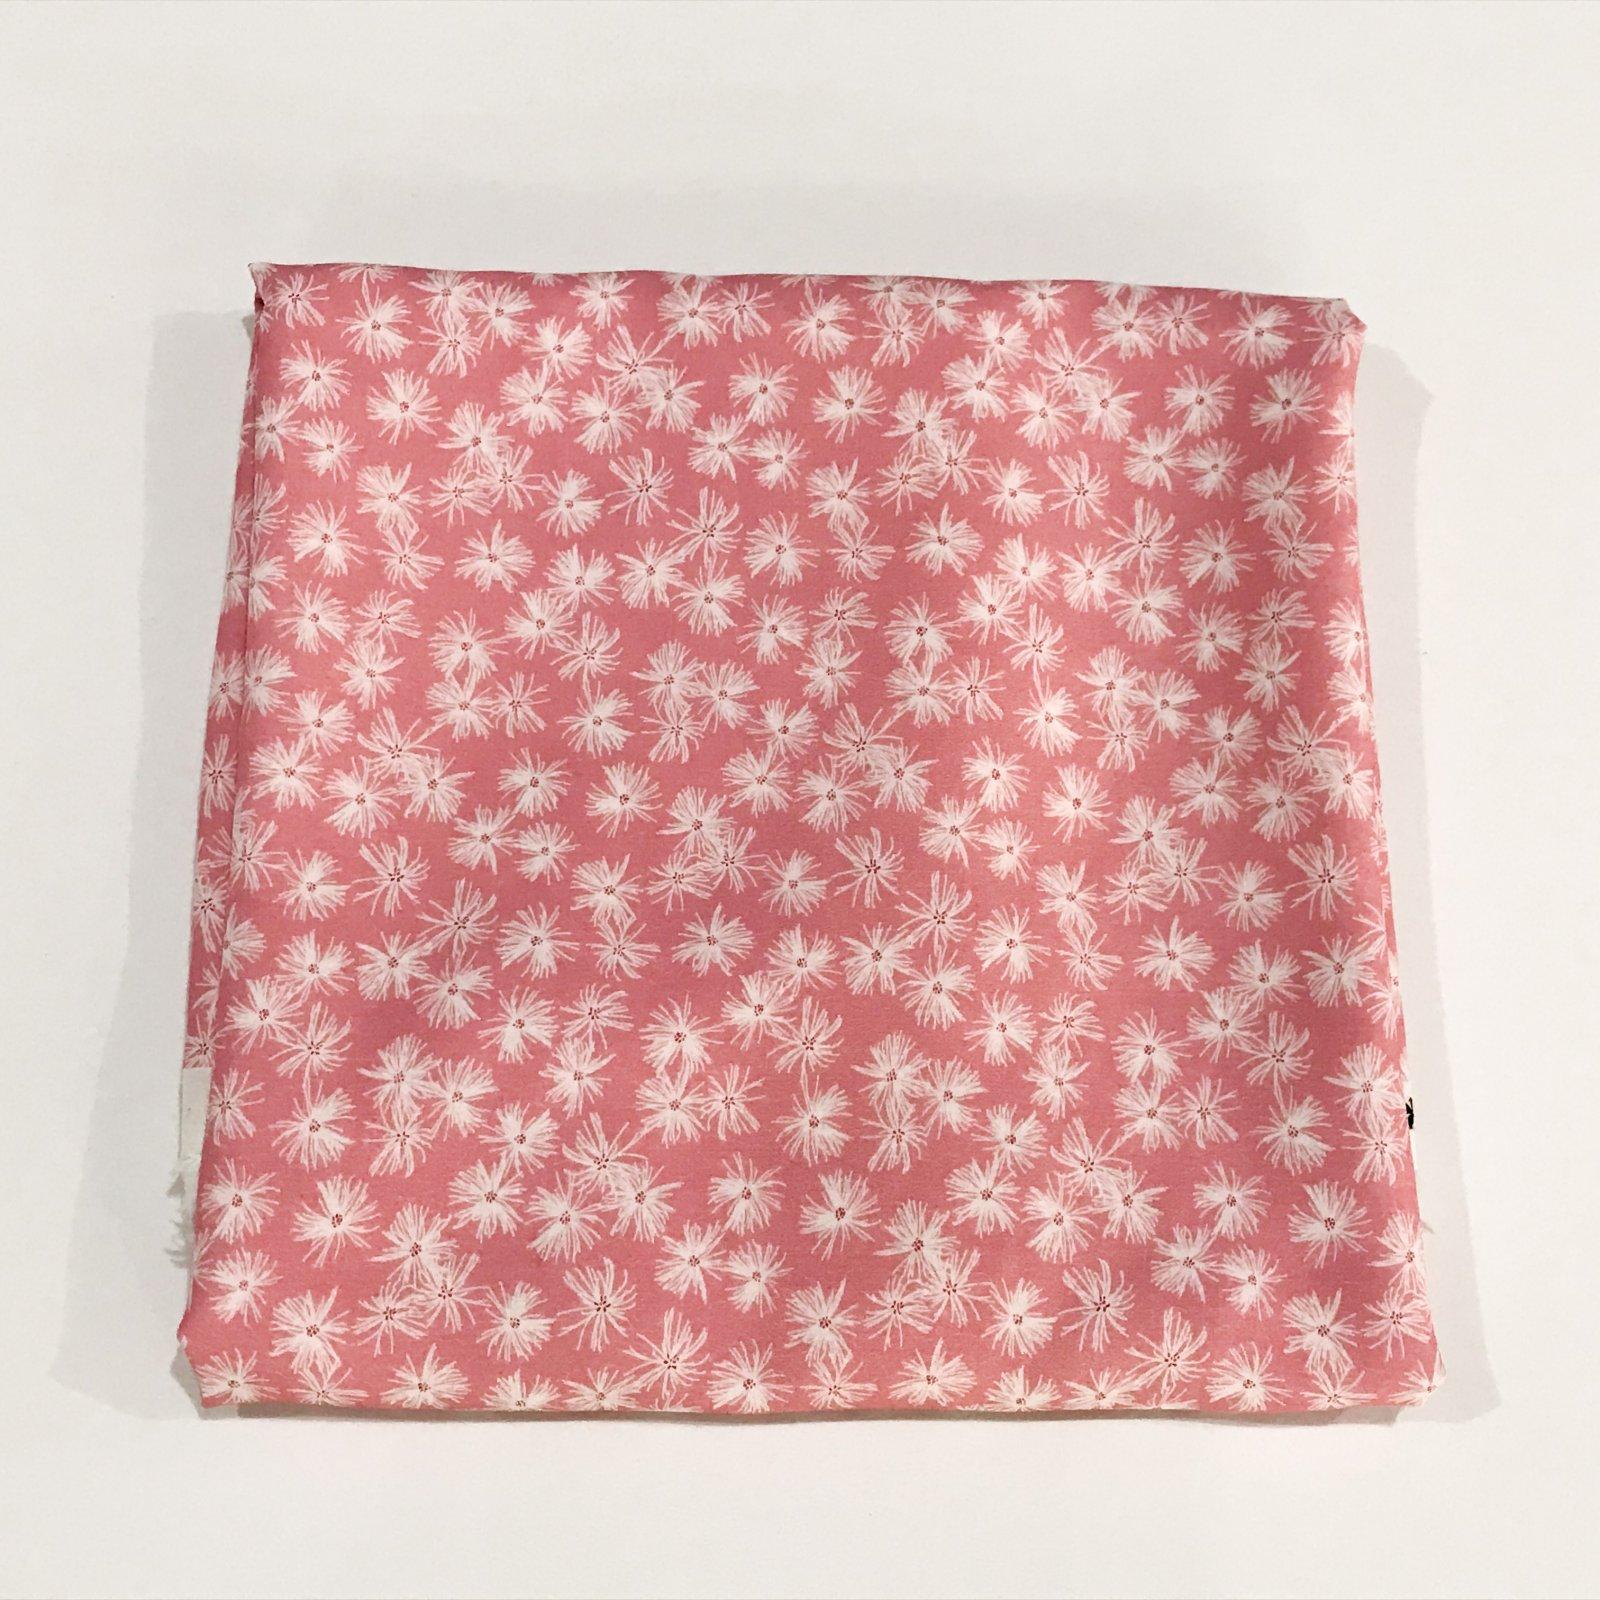 1 1/8 yard - Rayon Mt. Meadow Whisper Pink